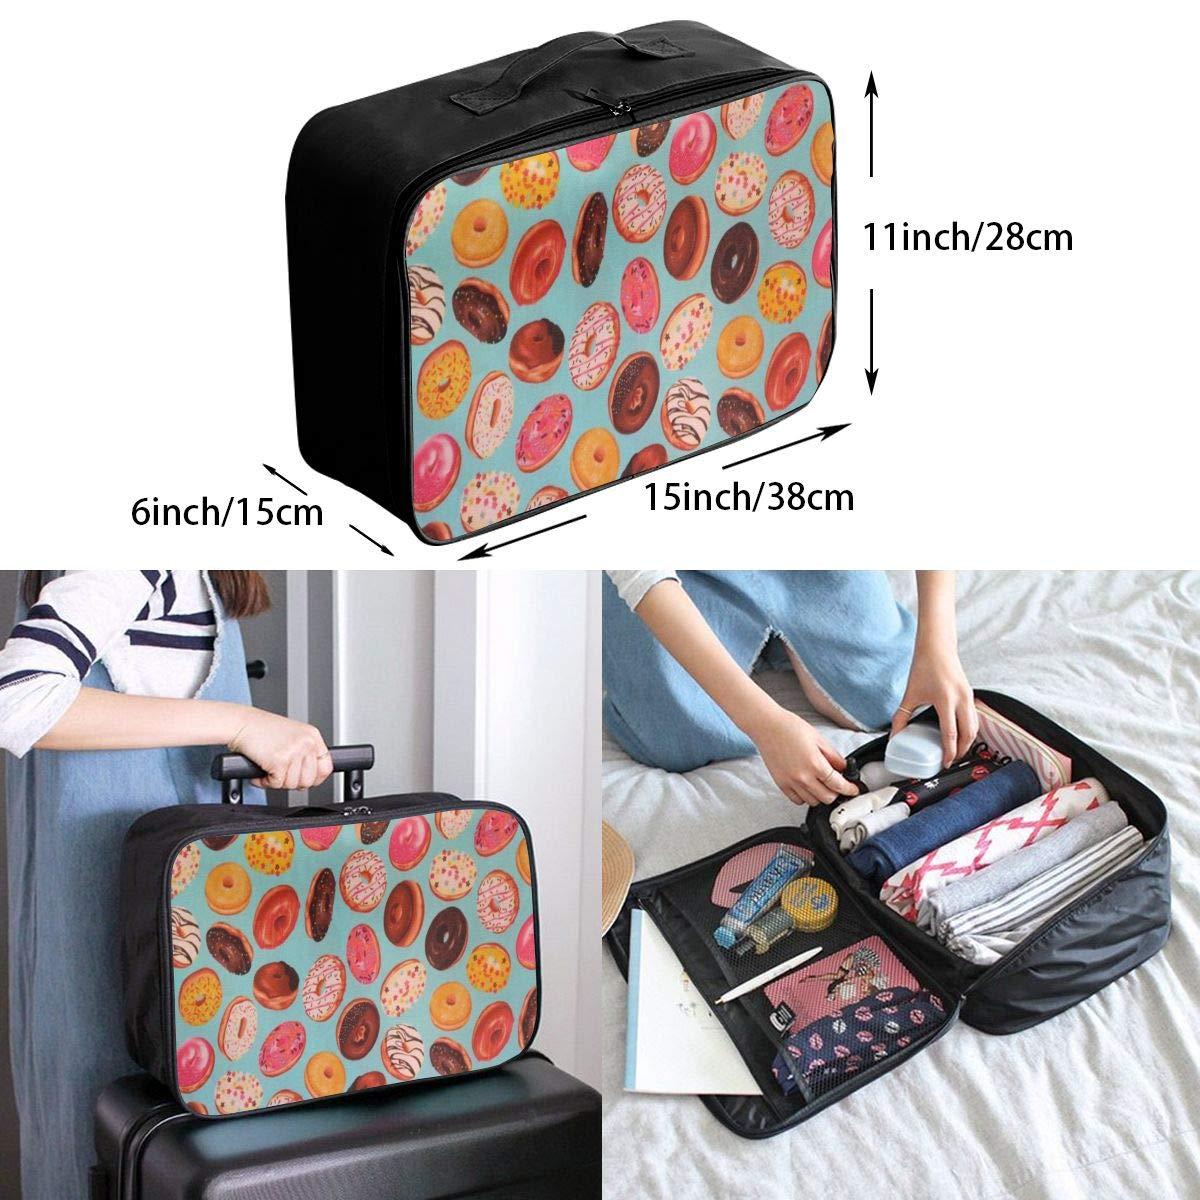 Women /& Men Foldable Travel Duffel Bag Delicious Doughnuts For Luggage Gym Sports